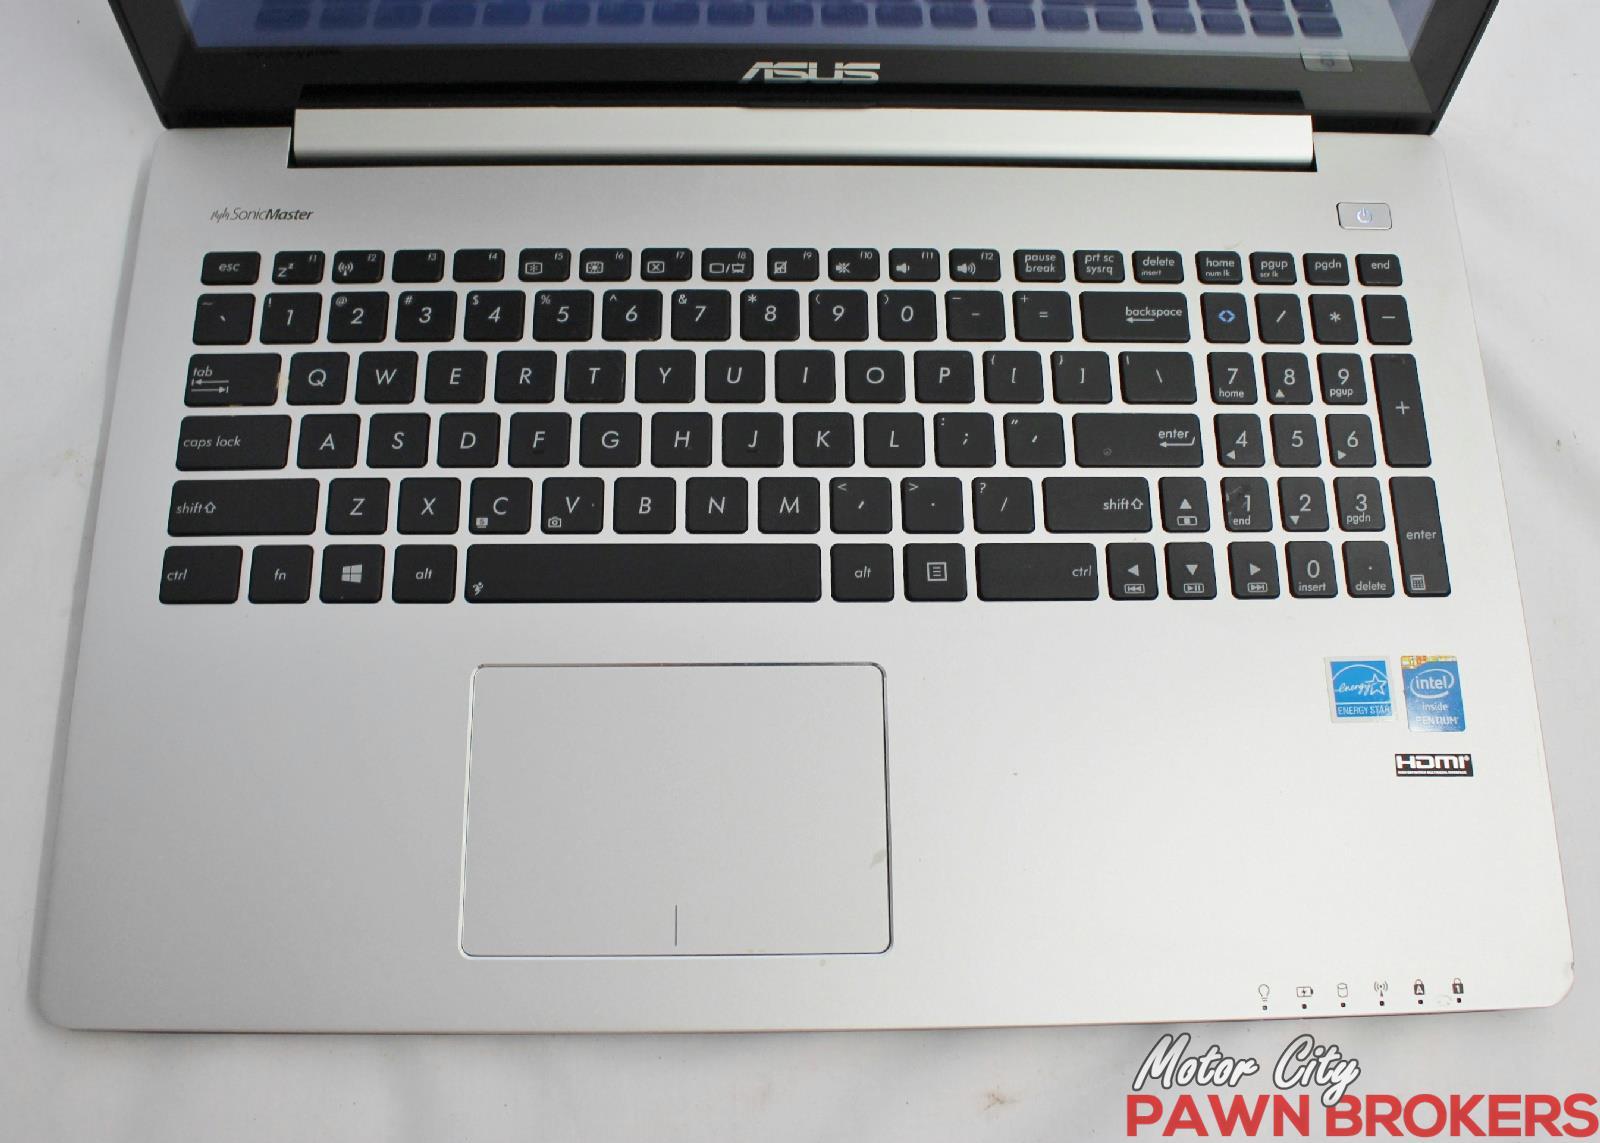 Asus vivobook s500c 15 6 500gb intel pentium 1 8ghz for Motor city pawn shop